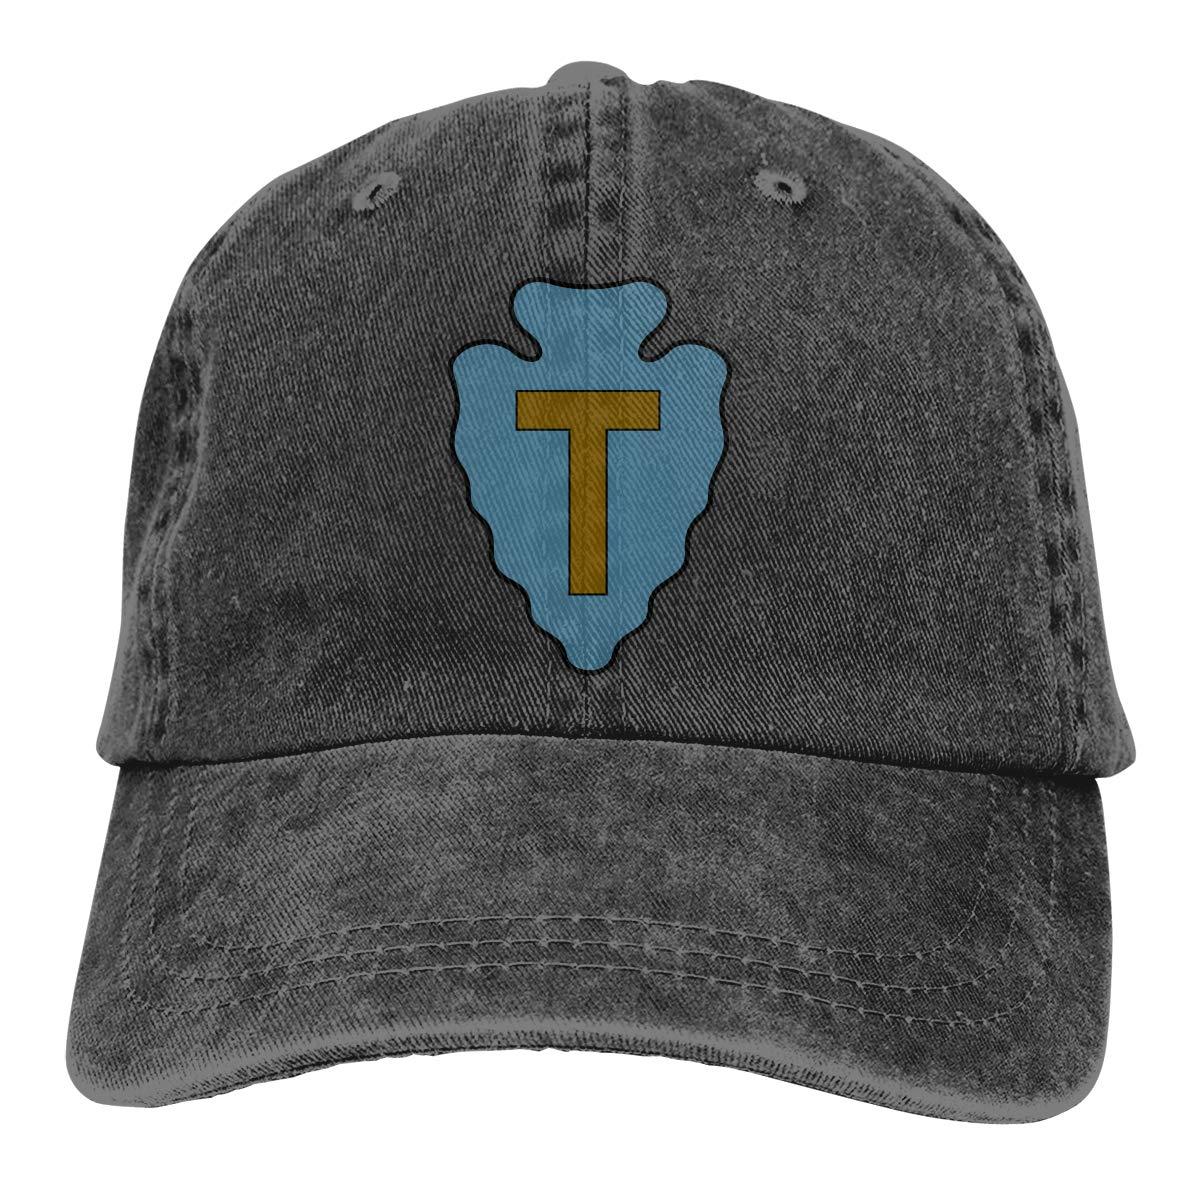 Sajfirlug US Marines Fashion Adjustable Cowboy Cap Denim Hat for Women and Men